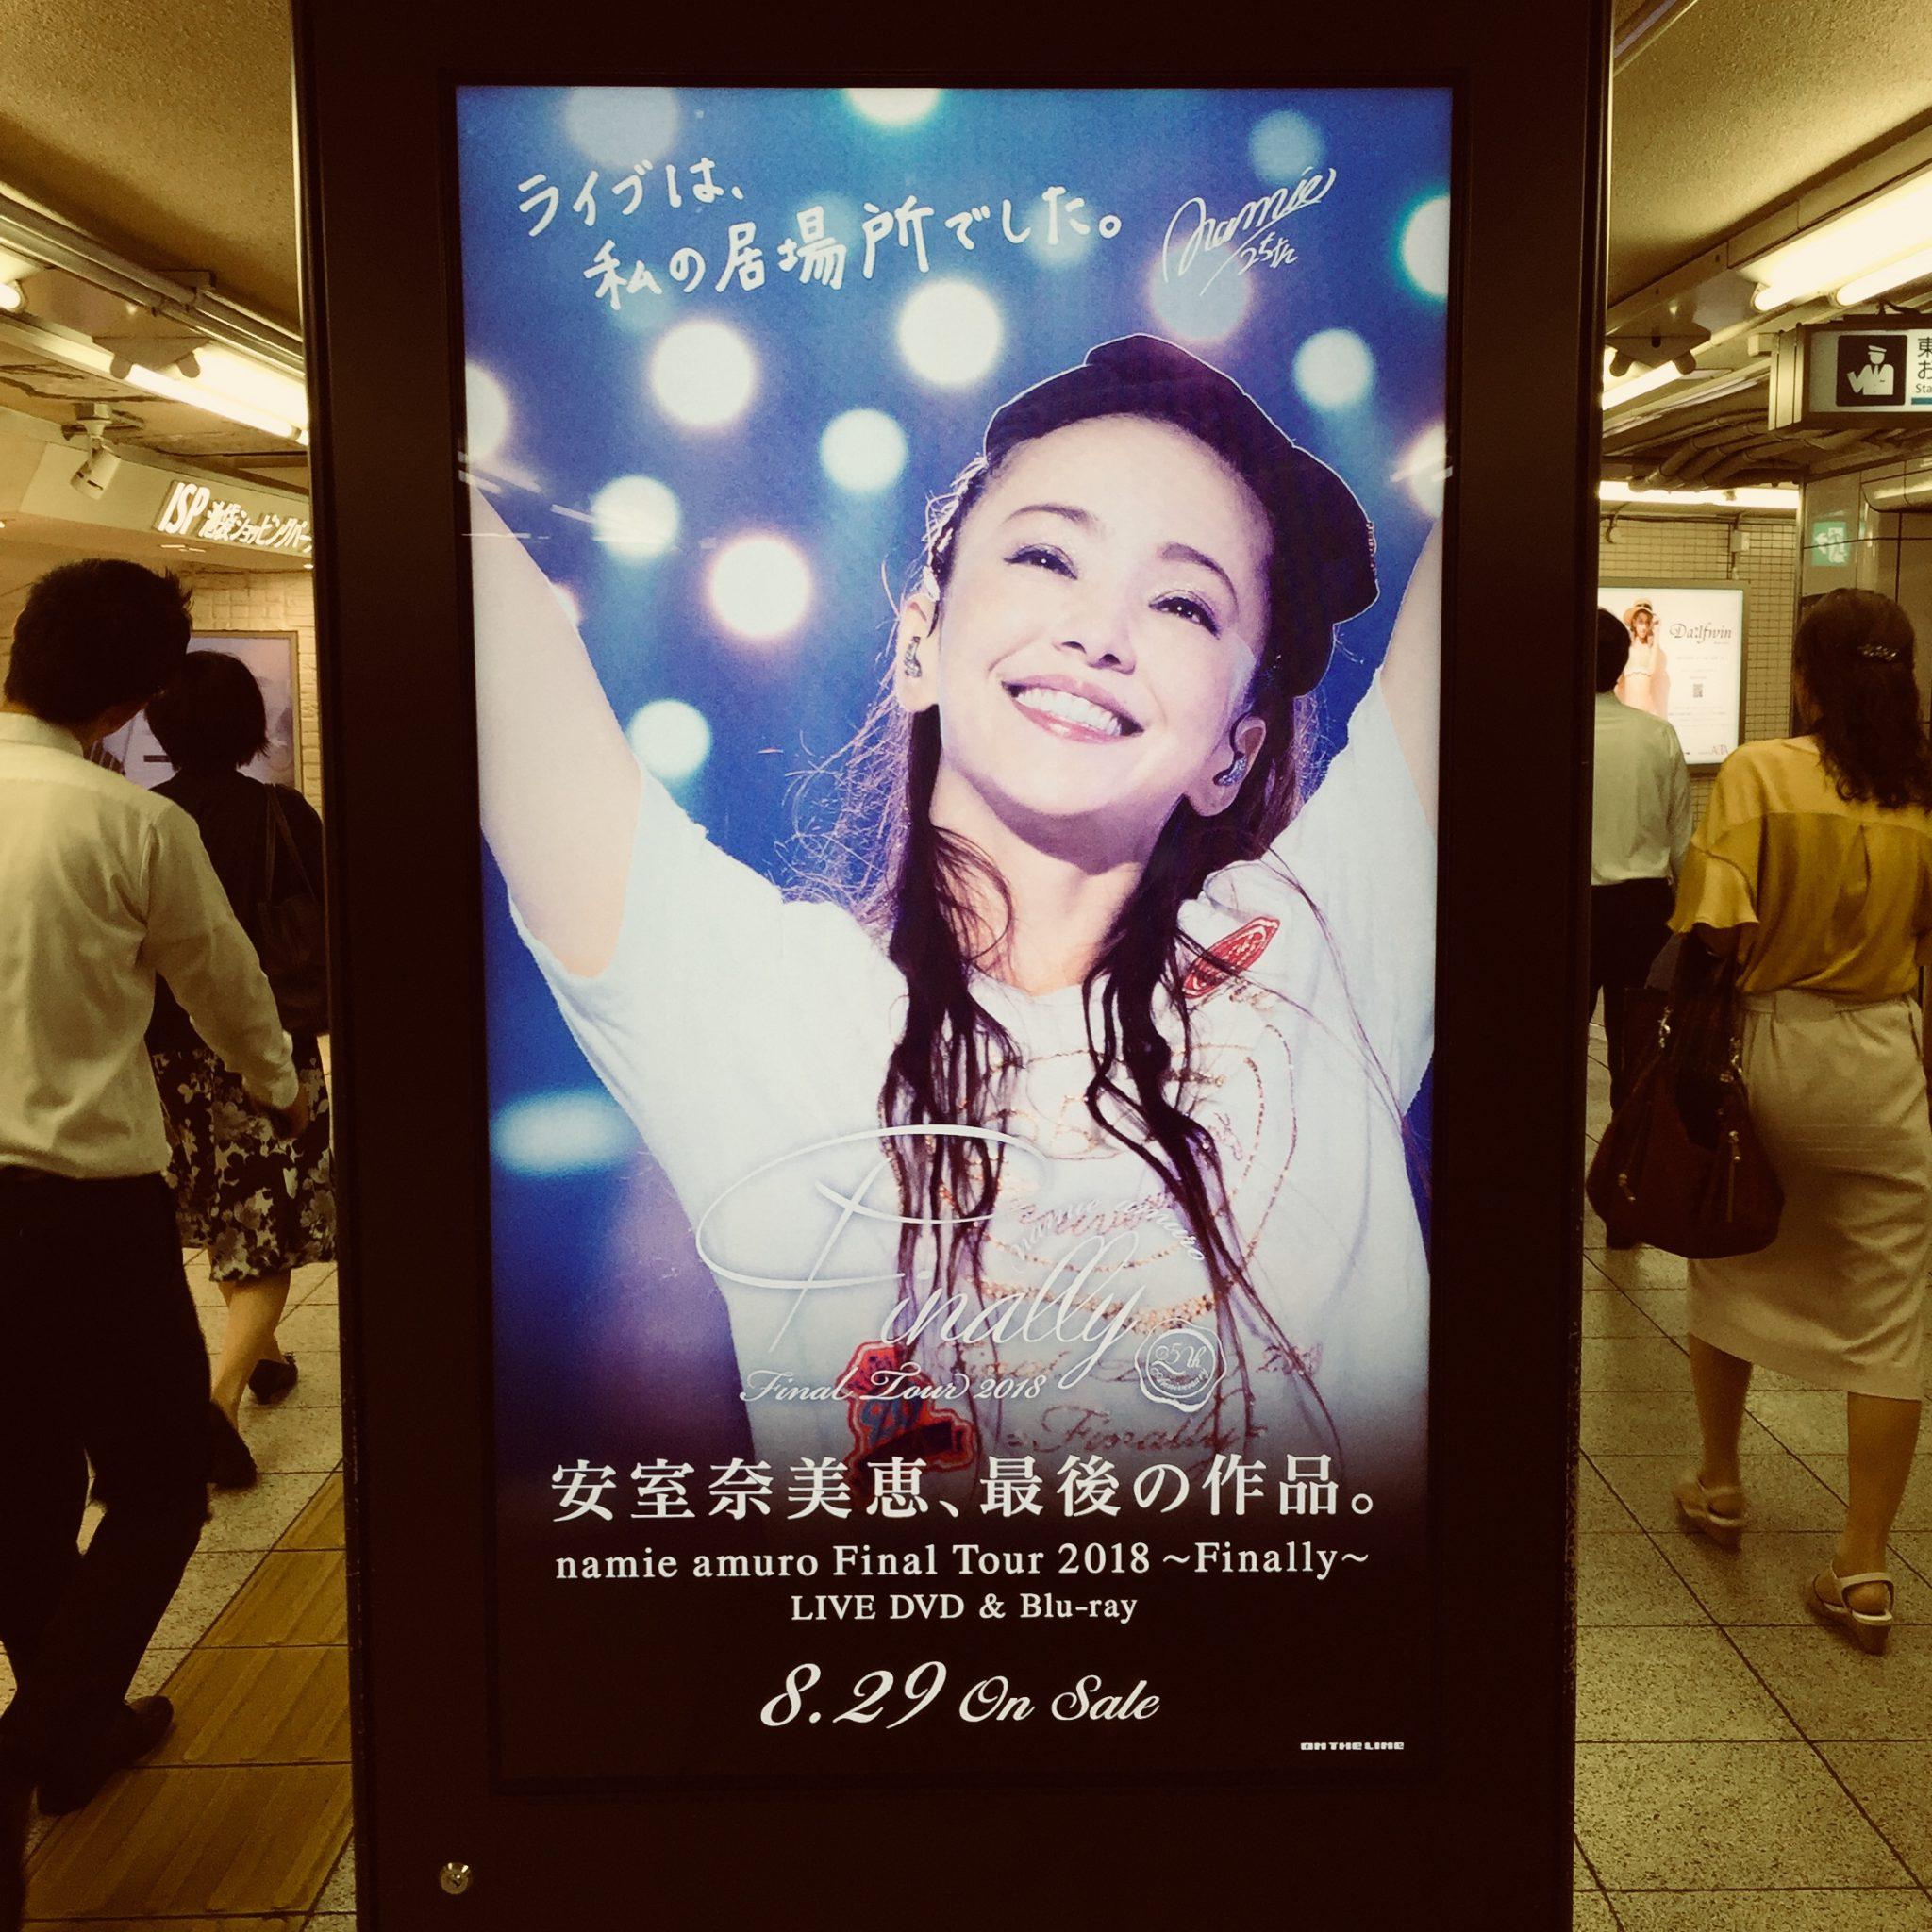 Namie Amuro: Tokyo ON #042: Get to the Chopper